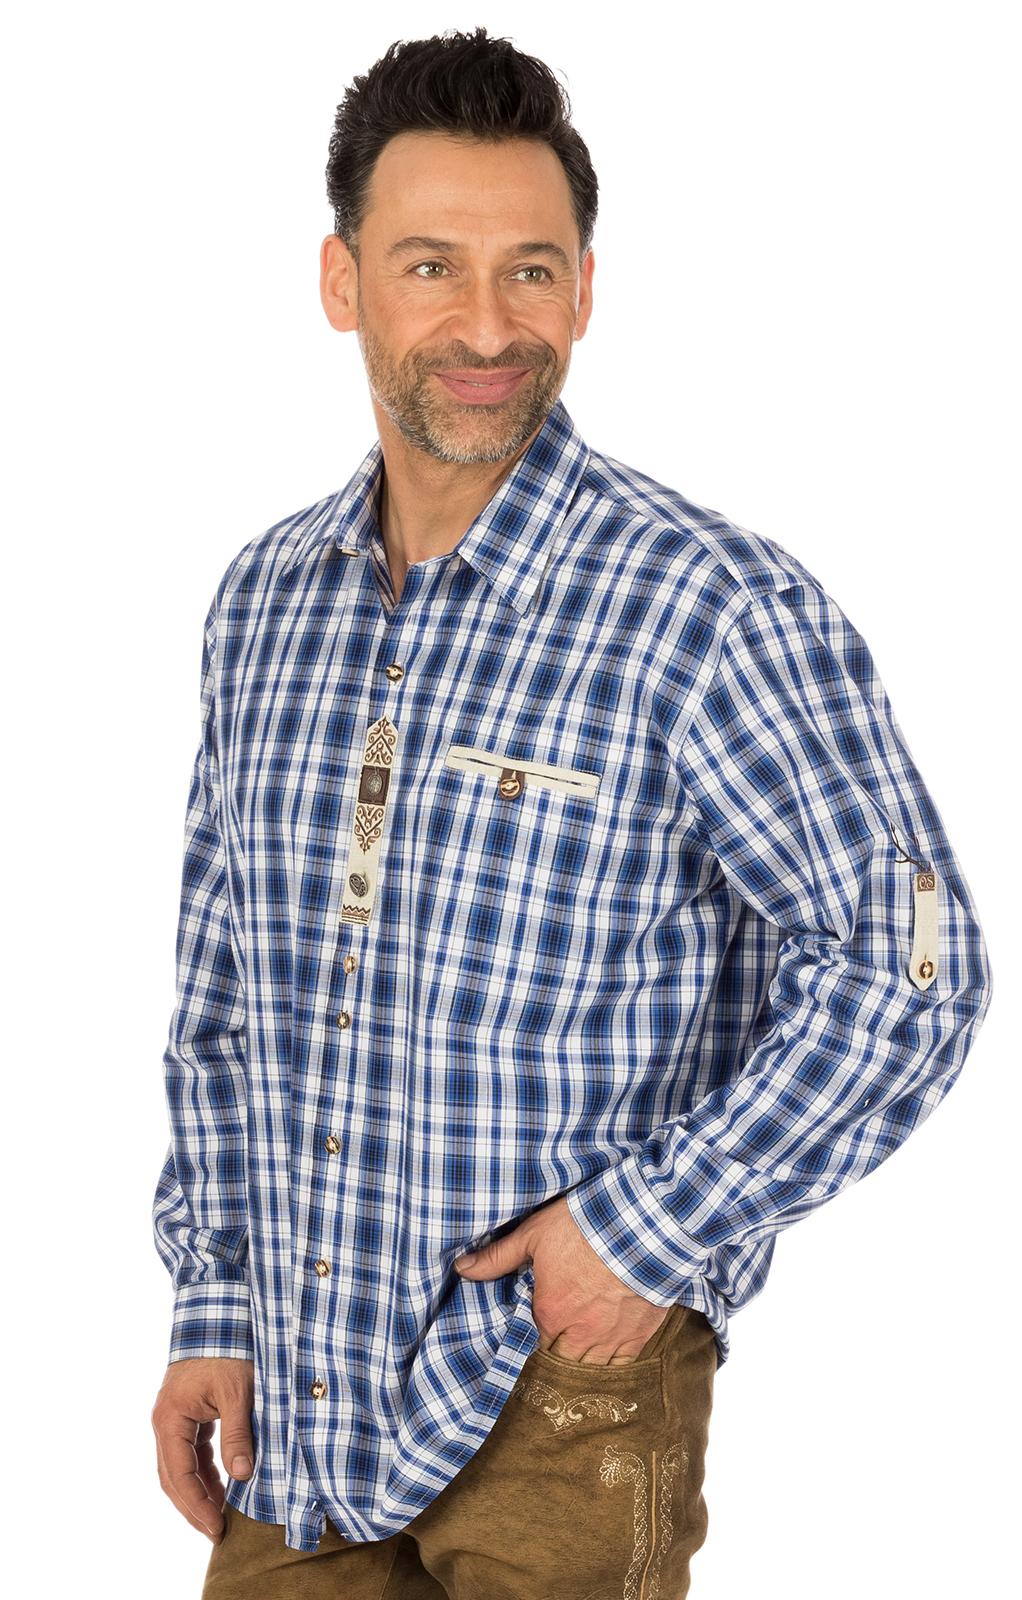 Camicia per Trachten a quadretti blu von OS-Trachten